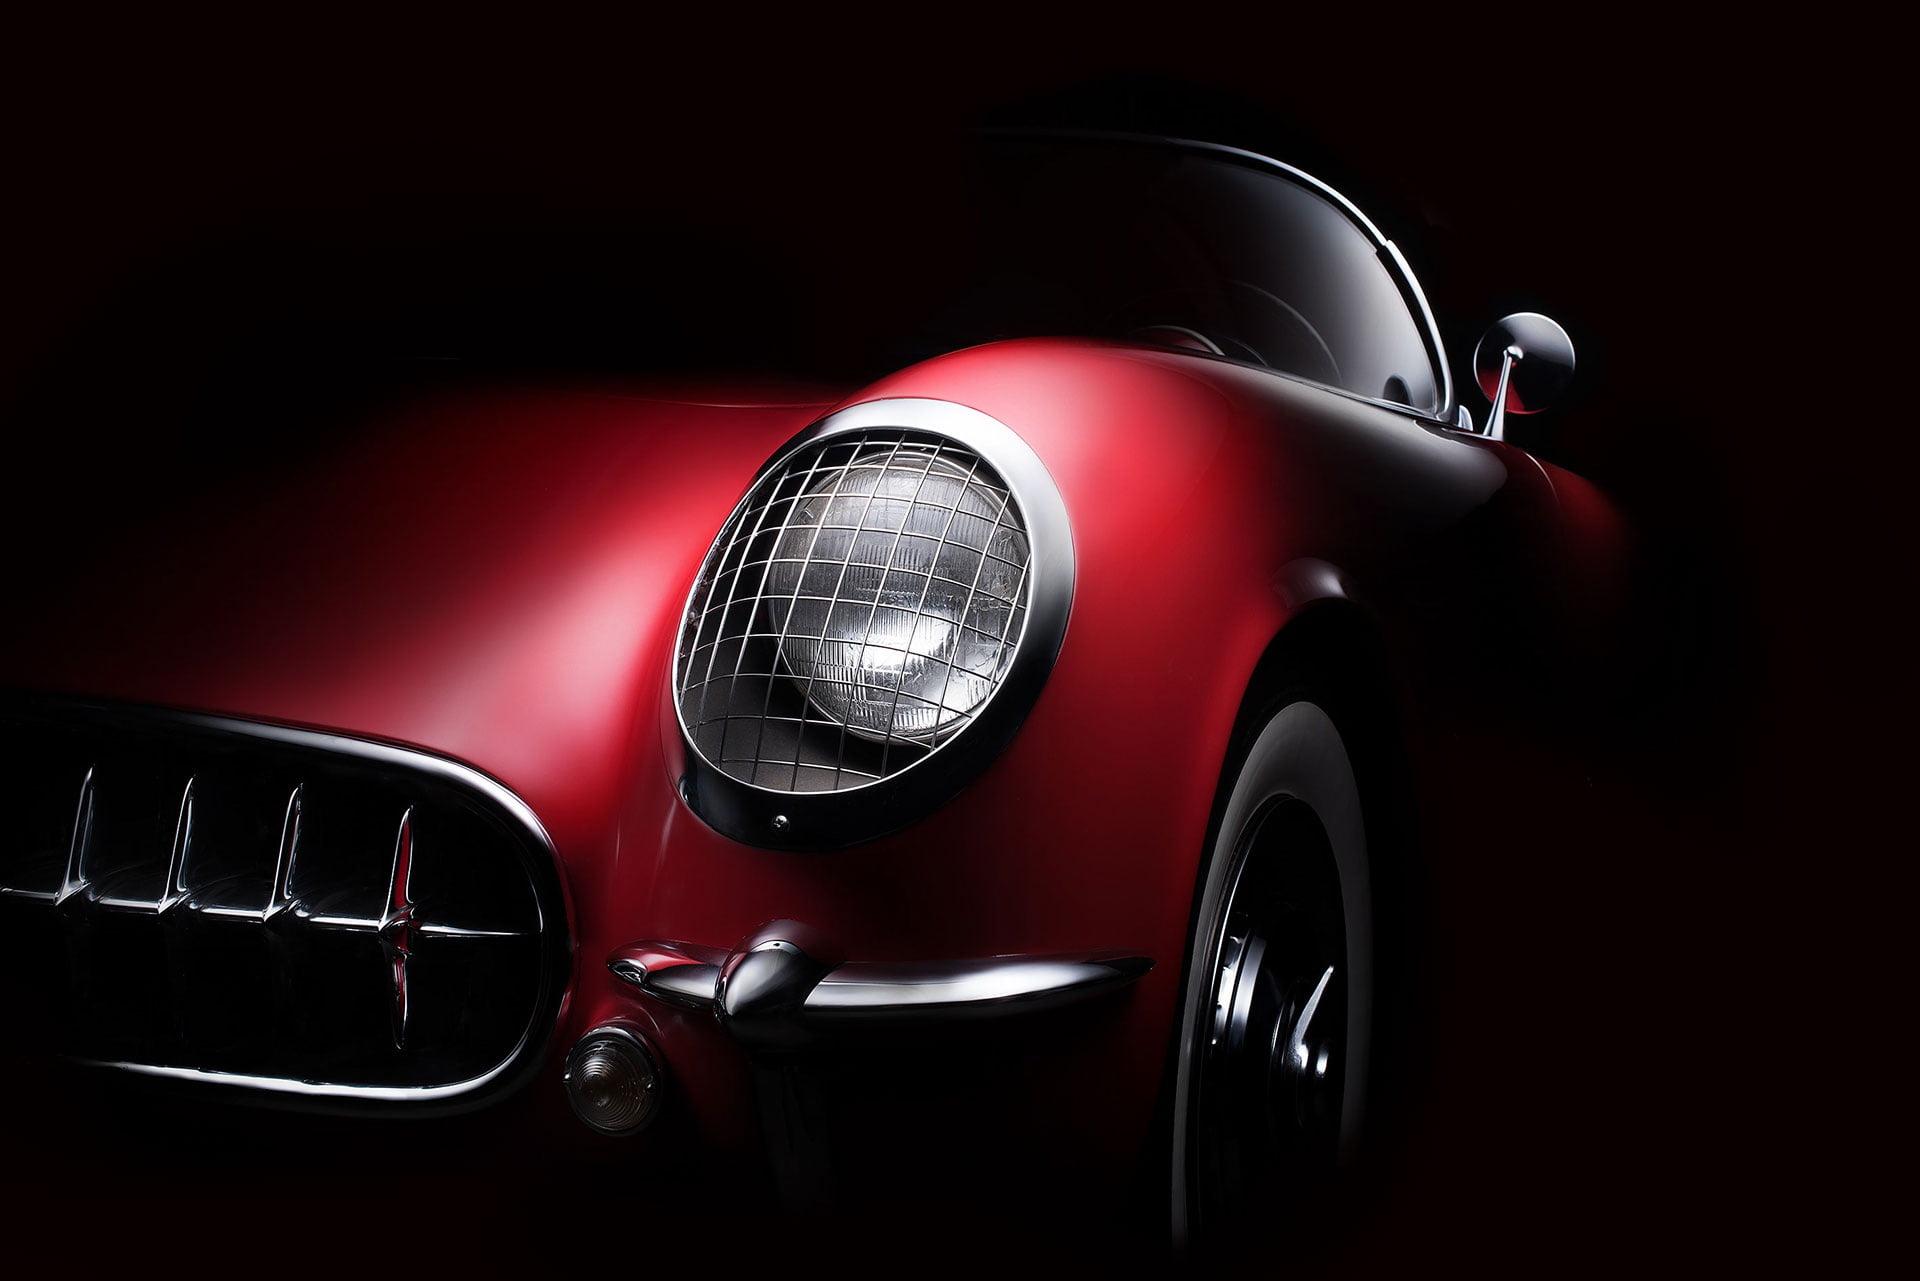 Red Car Dark Background 1920x1281 Wallpaper Teahub Io